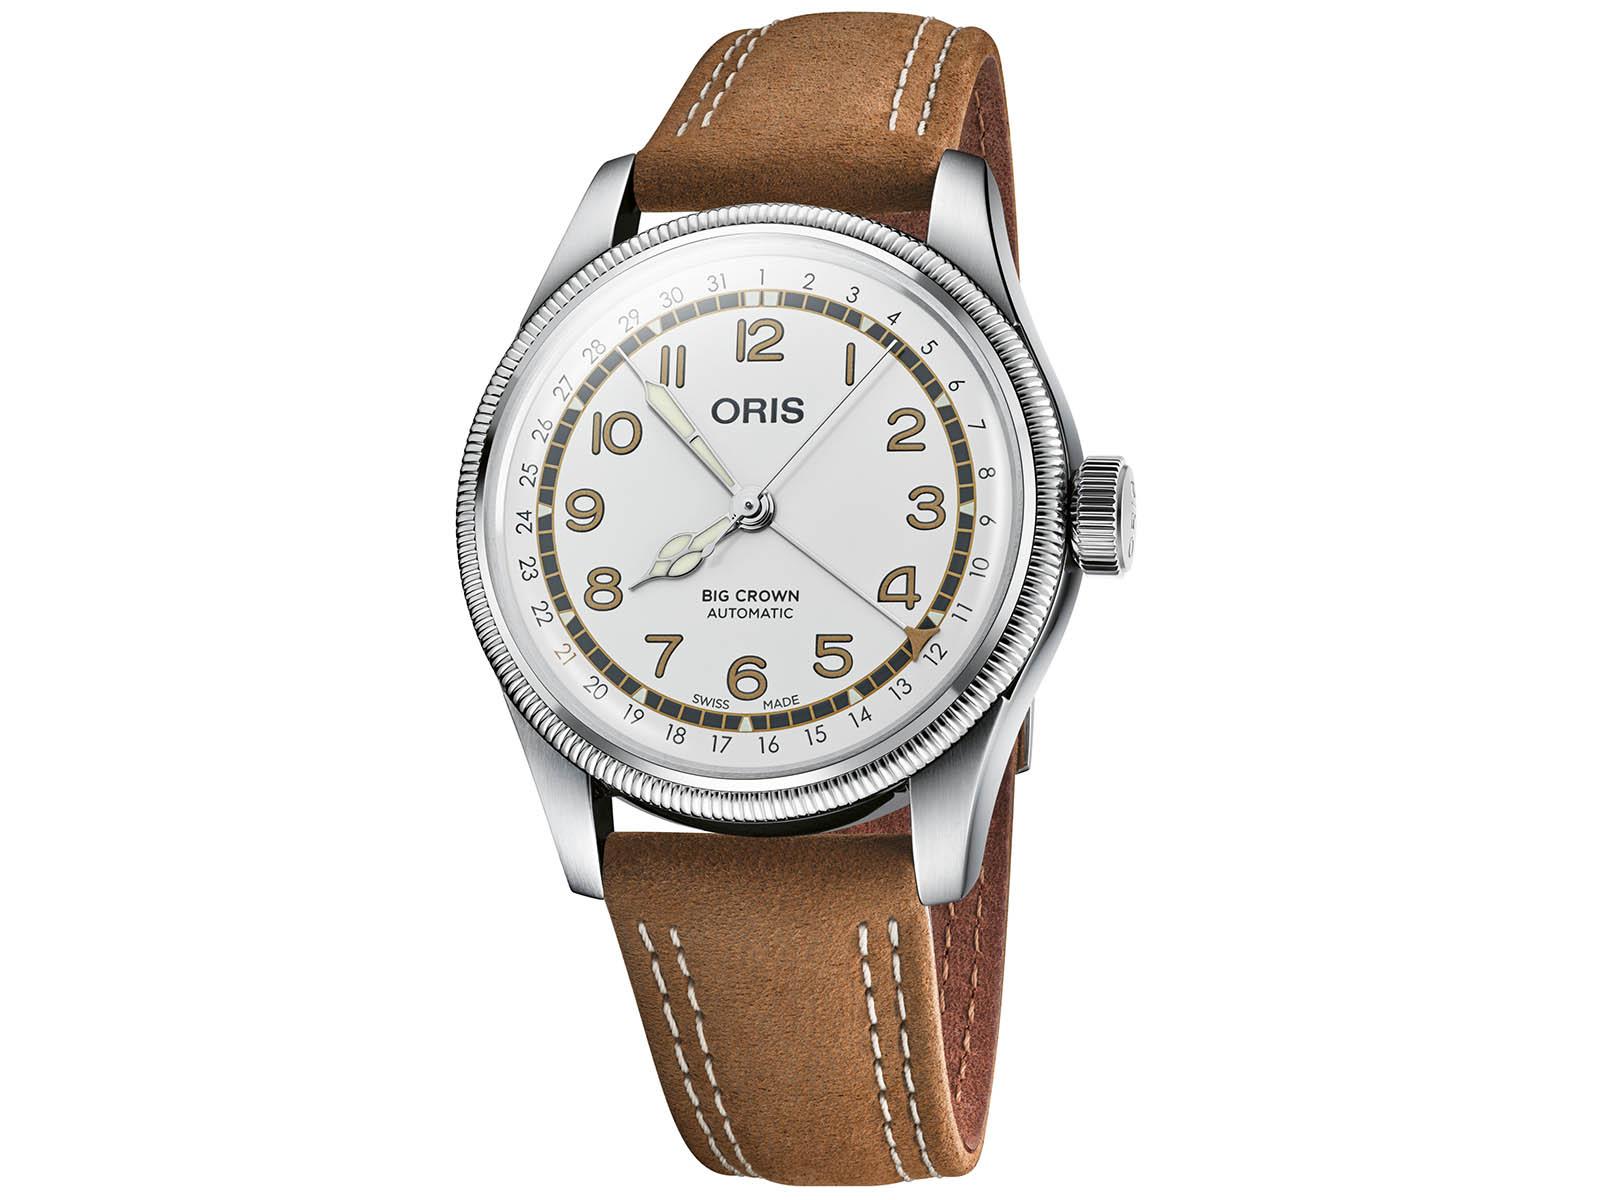 01-754-7741-4081-set-oris-roberto-clemente-limited-edition-4.jpg